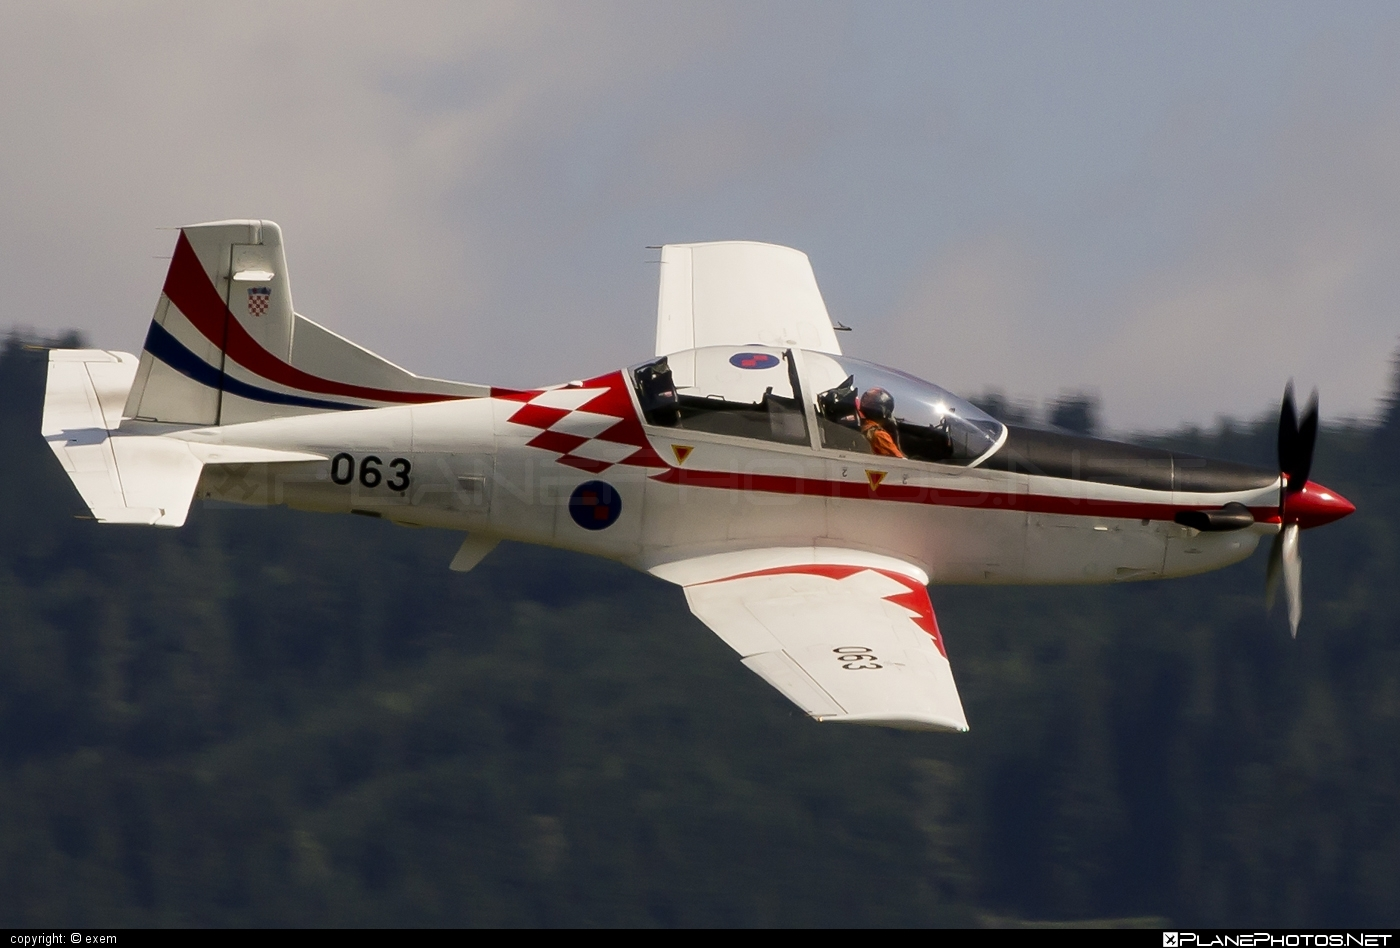 Pilatus PC-9M - 063 operated by Hrvatsko ratno zrakoplovstvo i protuzračna obrana (Croatian Air Force) #pilatus